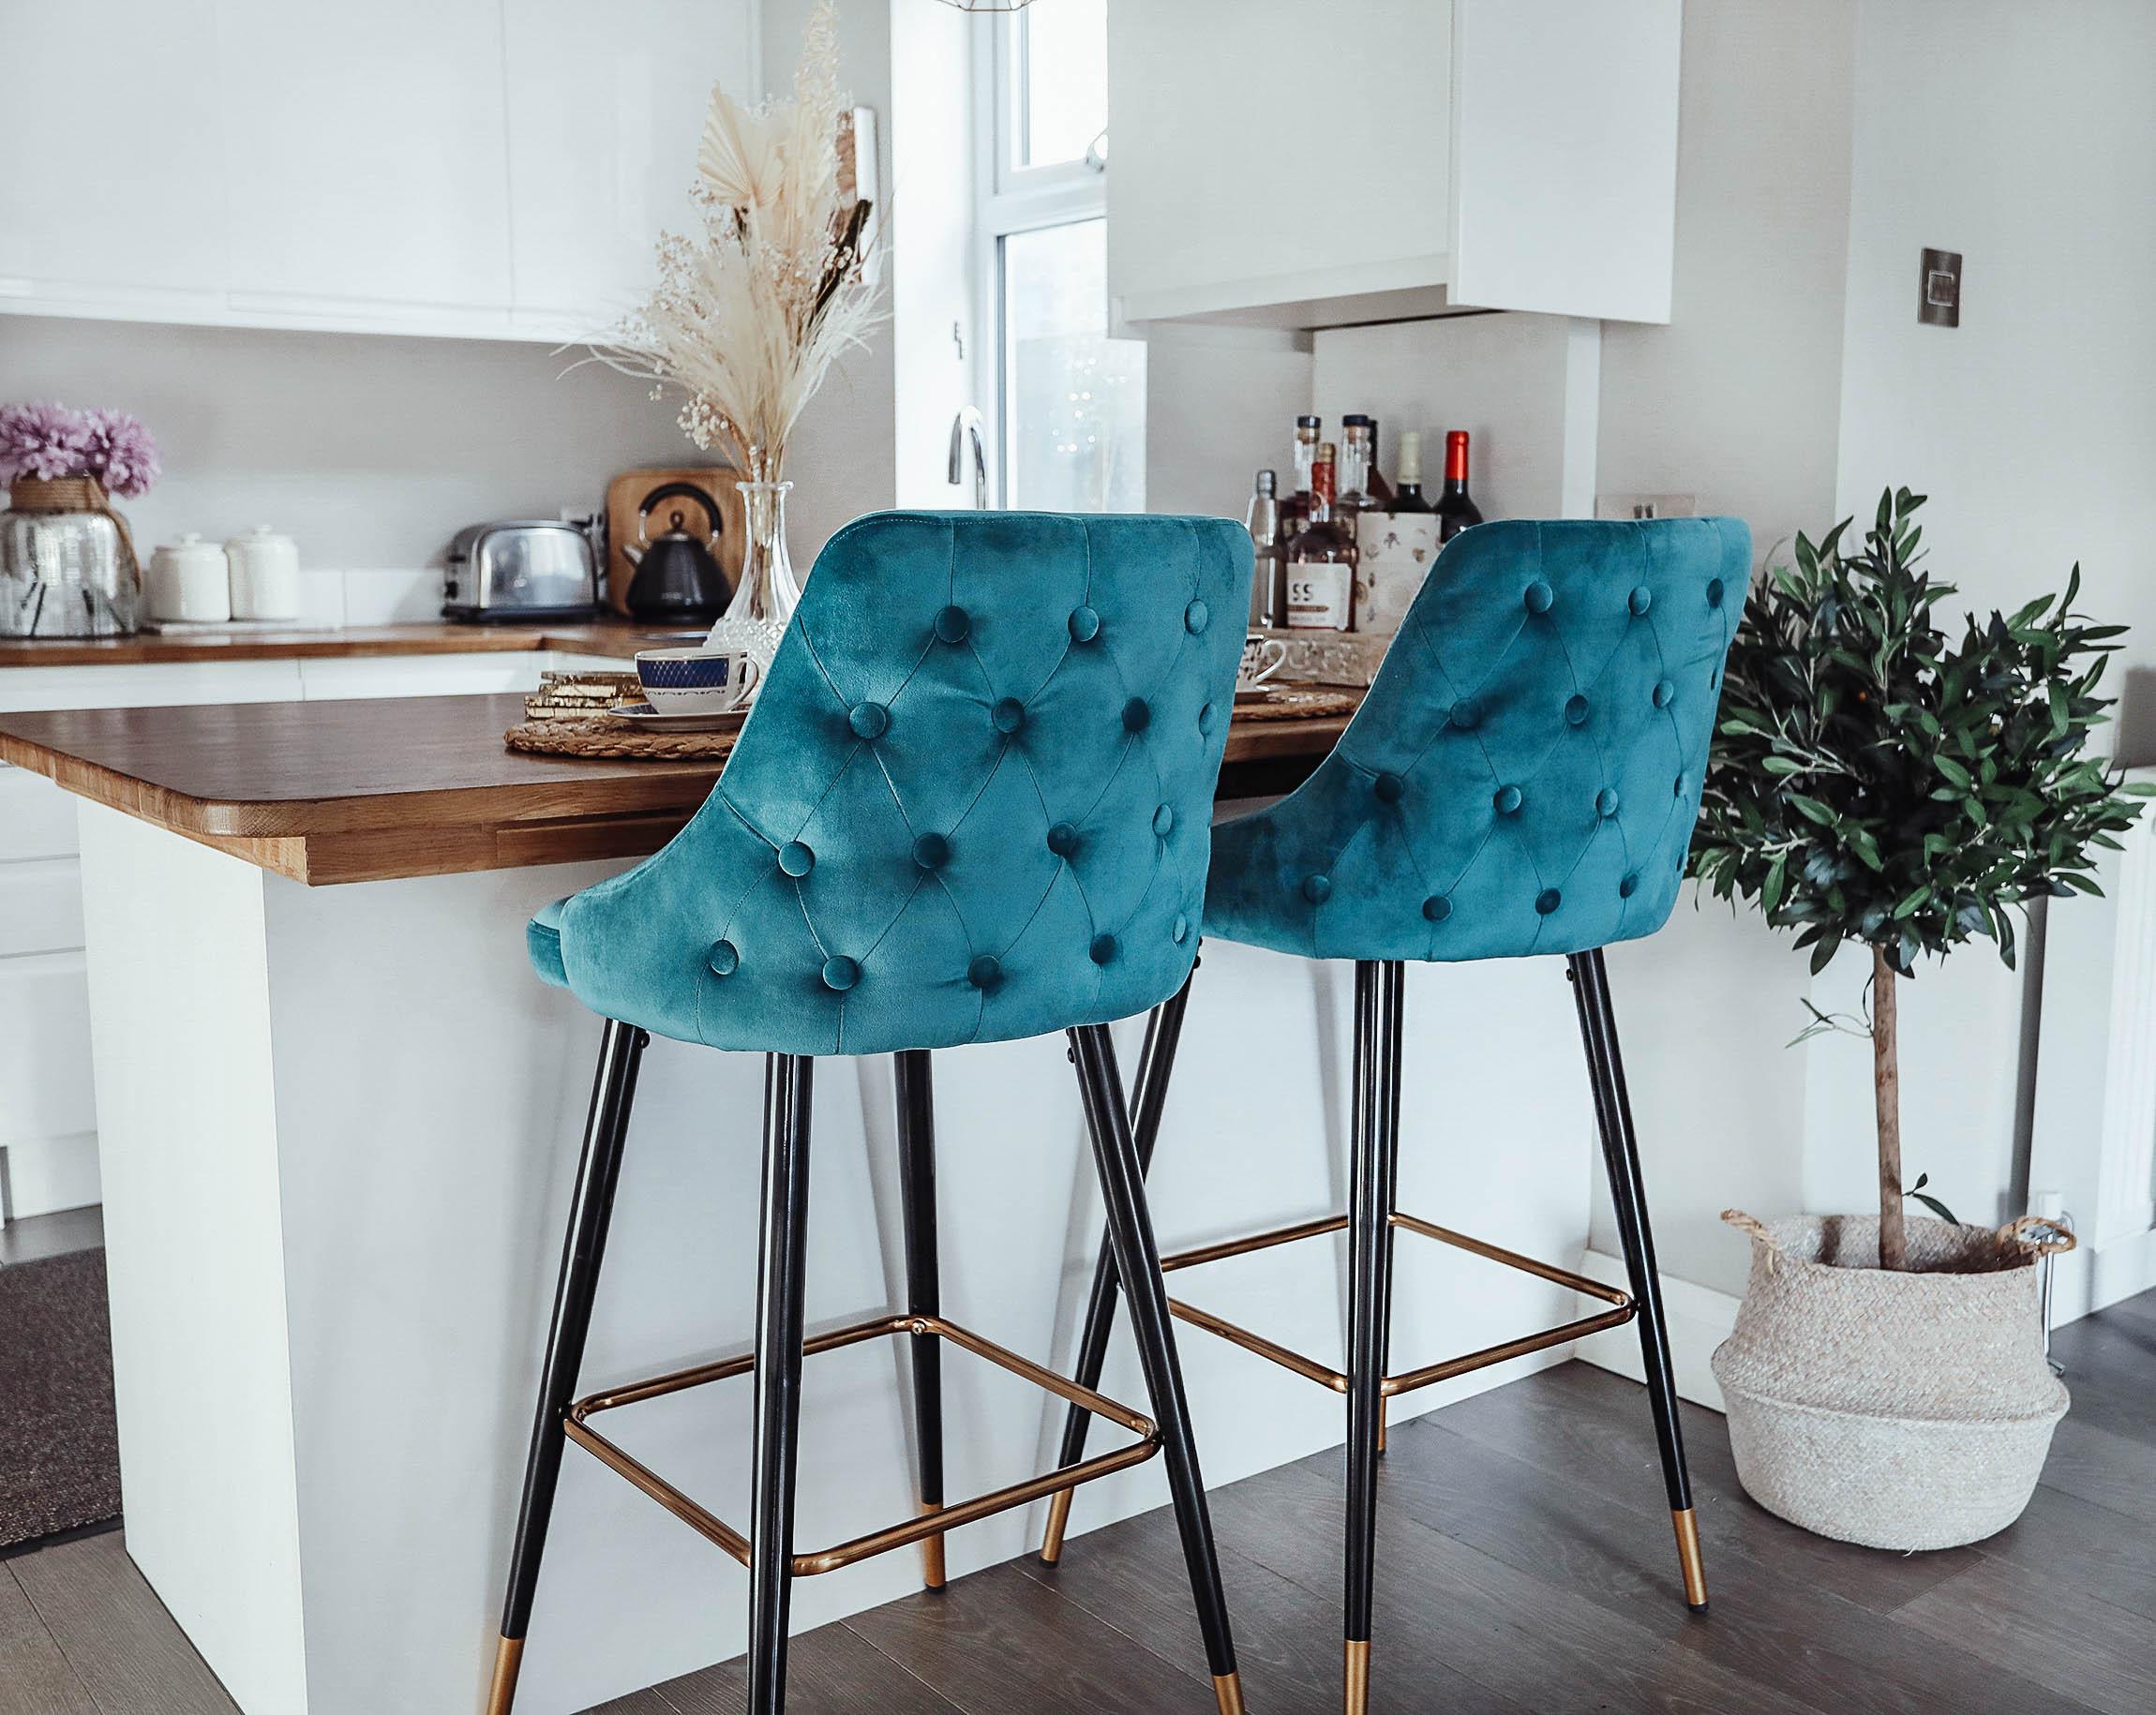 Modern Kitchen Bar Stools   Cult Furniture - The Simone Magazine Modern Kitchen Bar Stools Cult Furniture